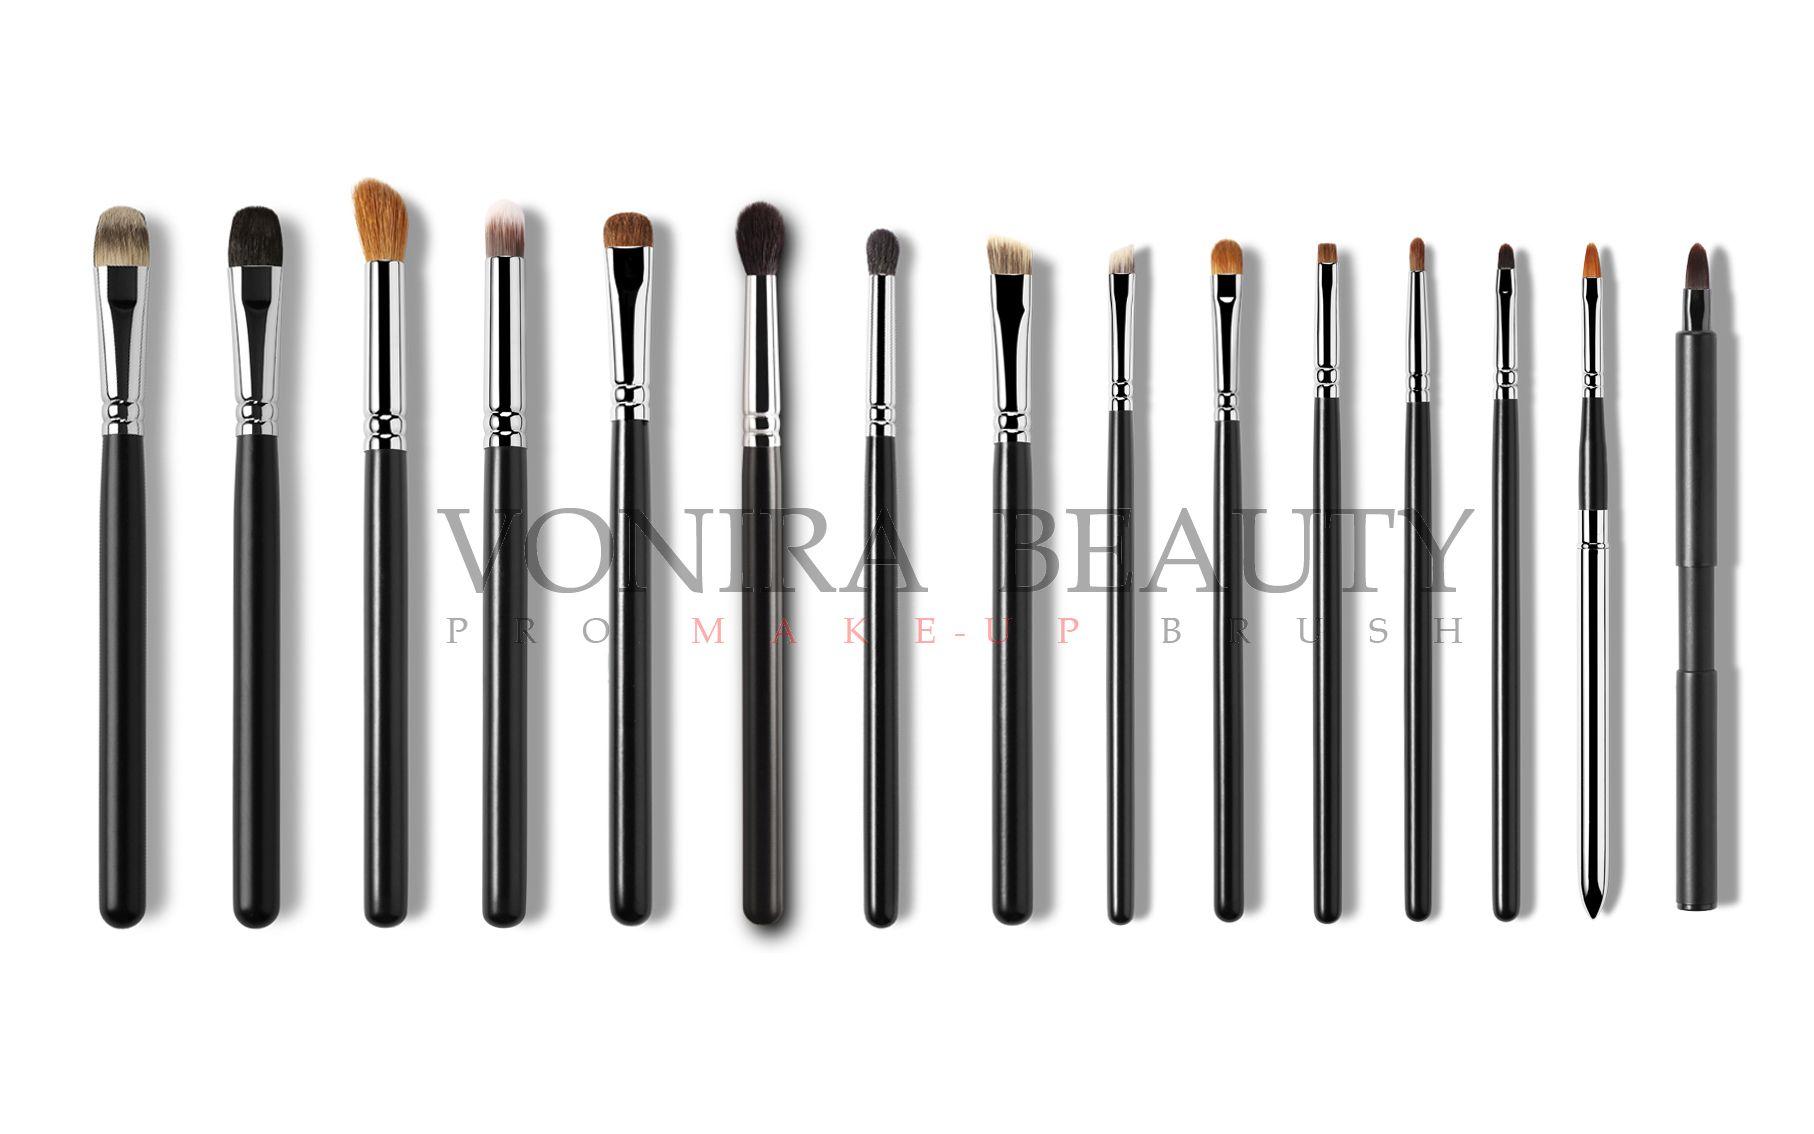 Vonira Beauty Professional Makeup Artist Special Eye Brush